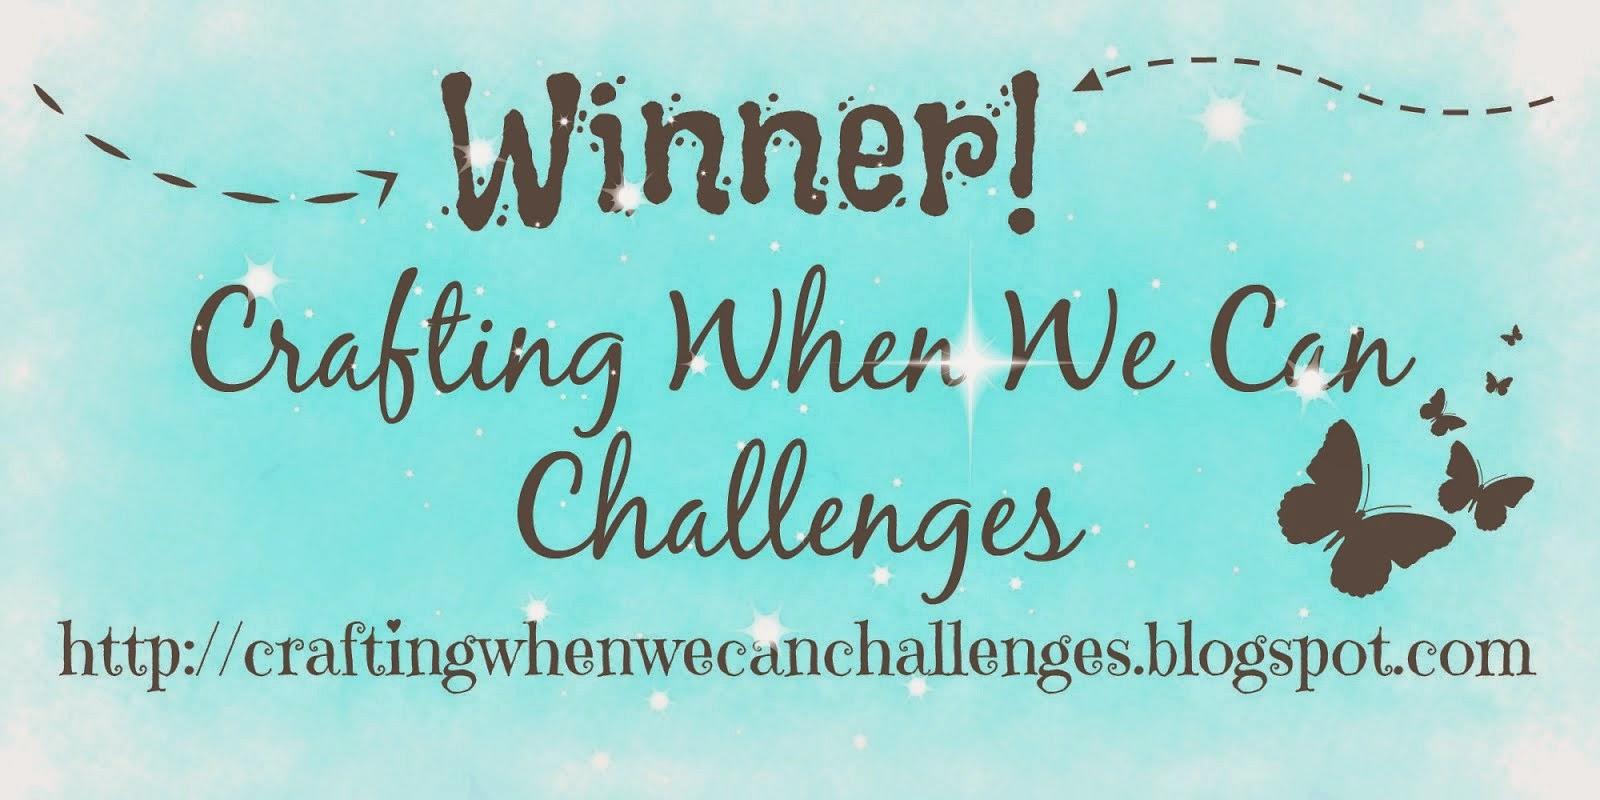 29 January 2017, Challenge 135